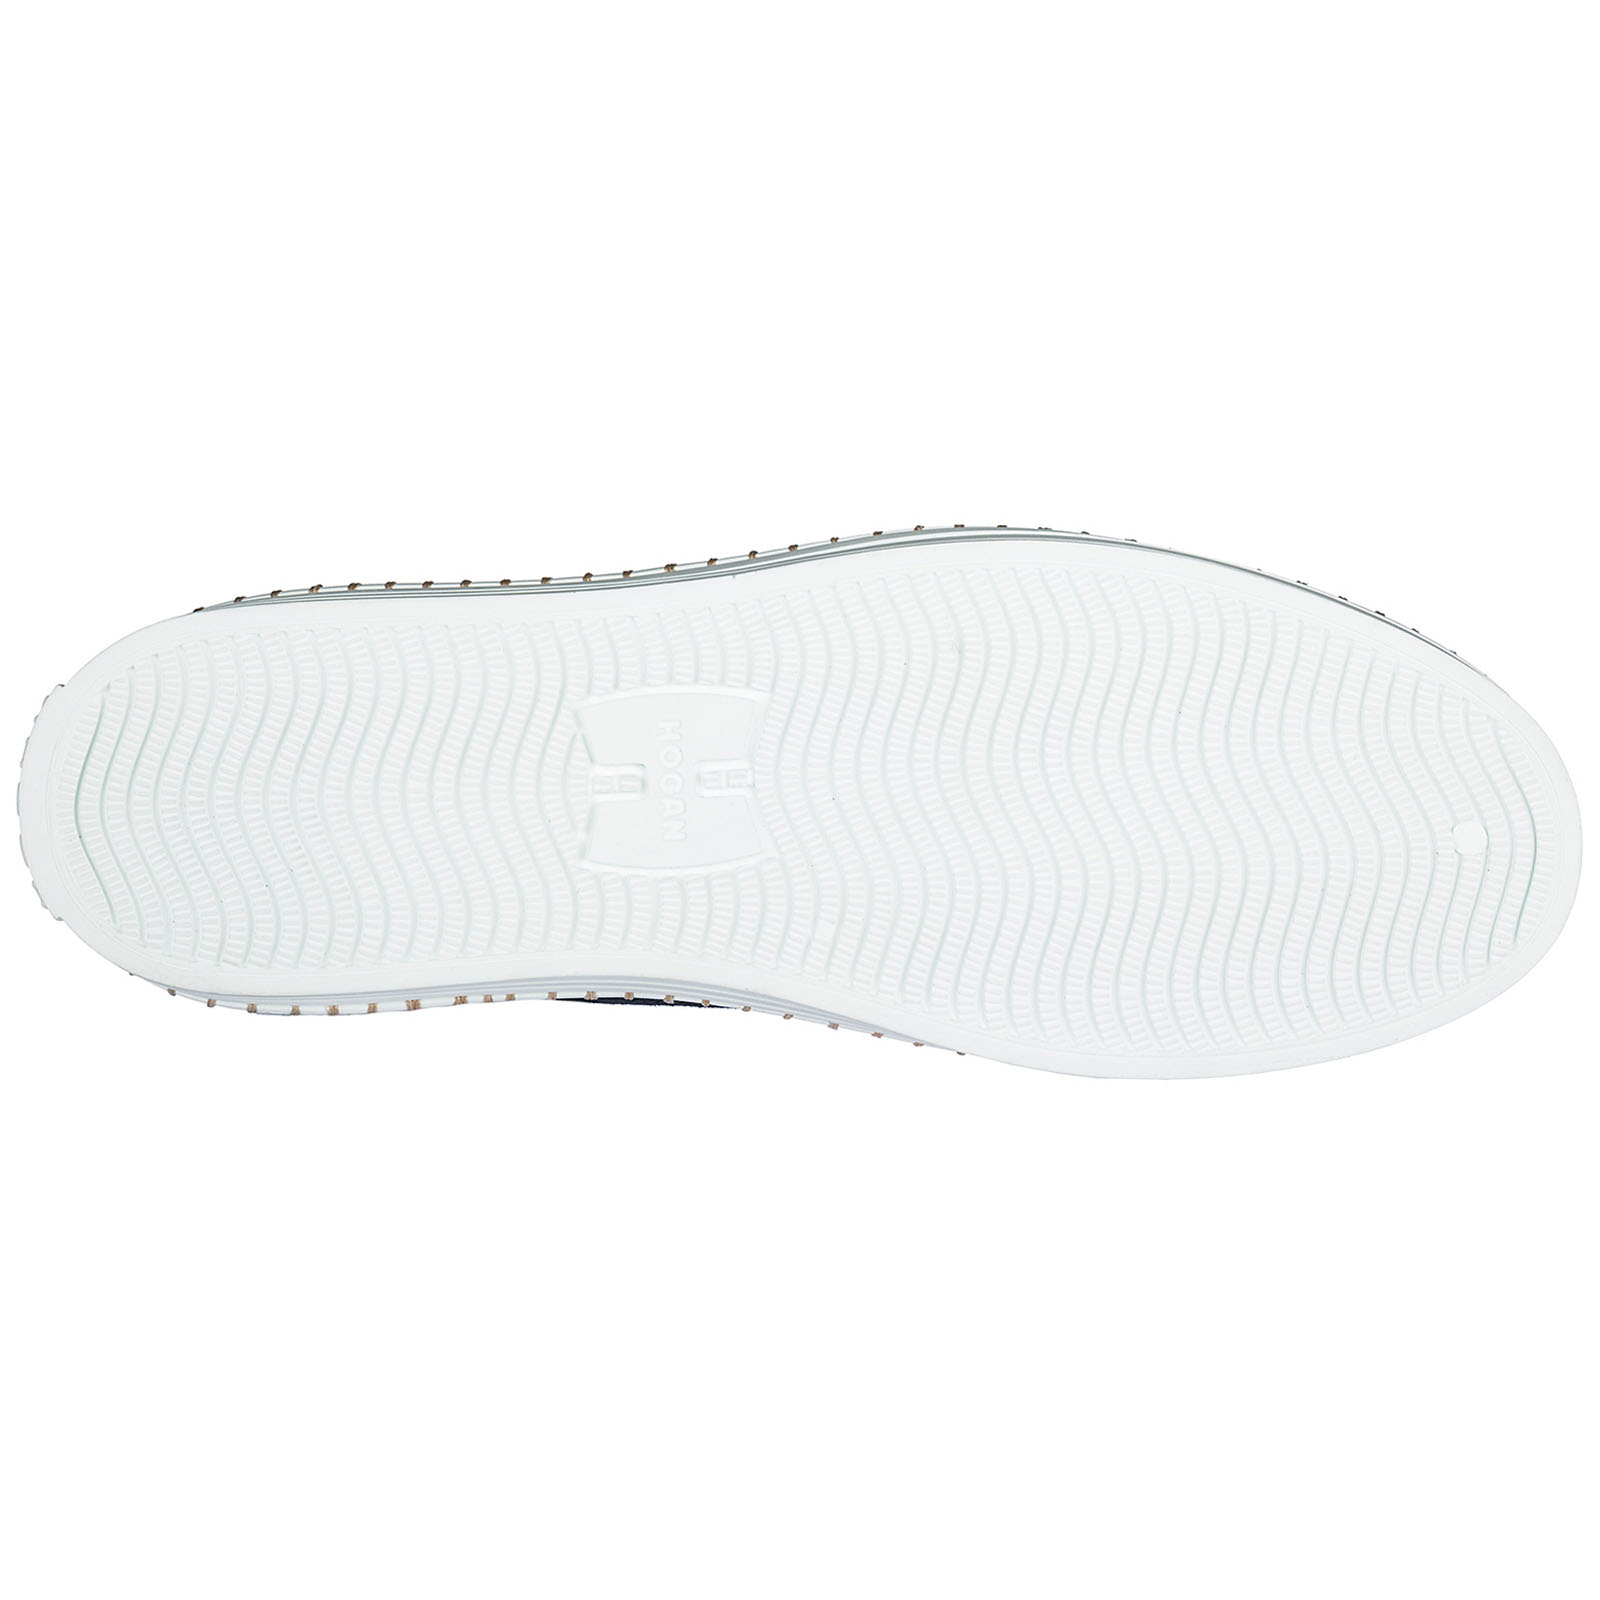 Sneakers Hogan R260 Hxw K850iop0pcf Blu